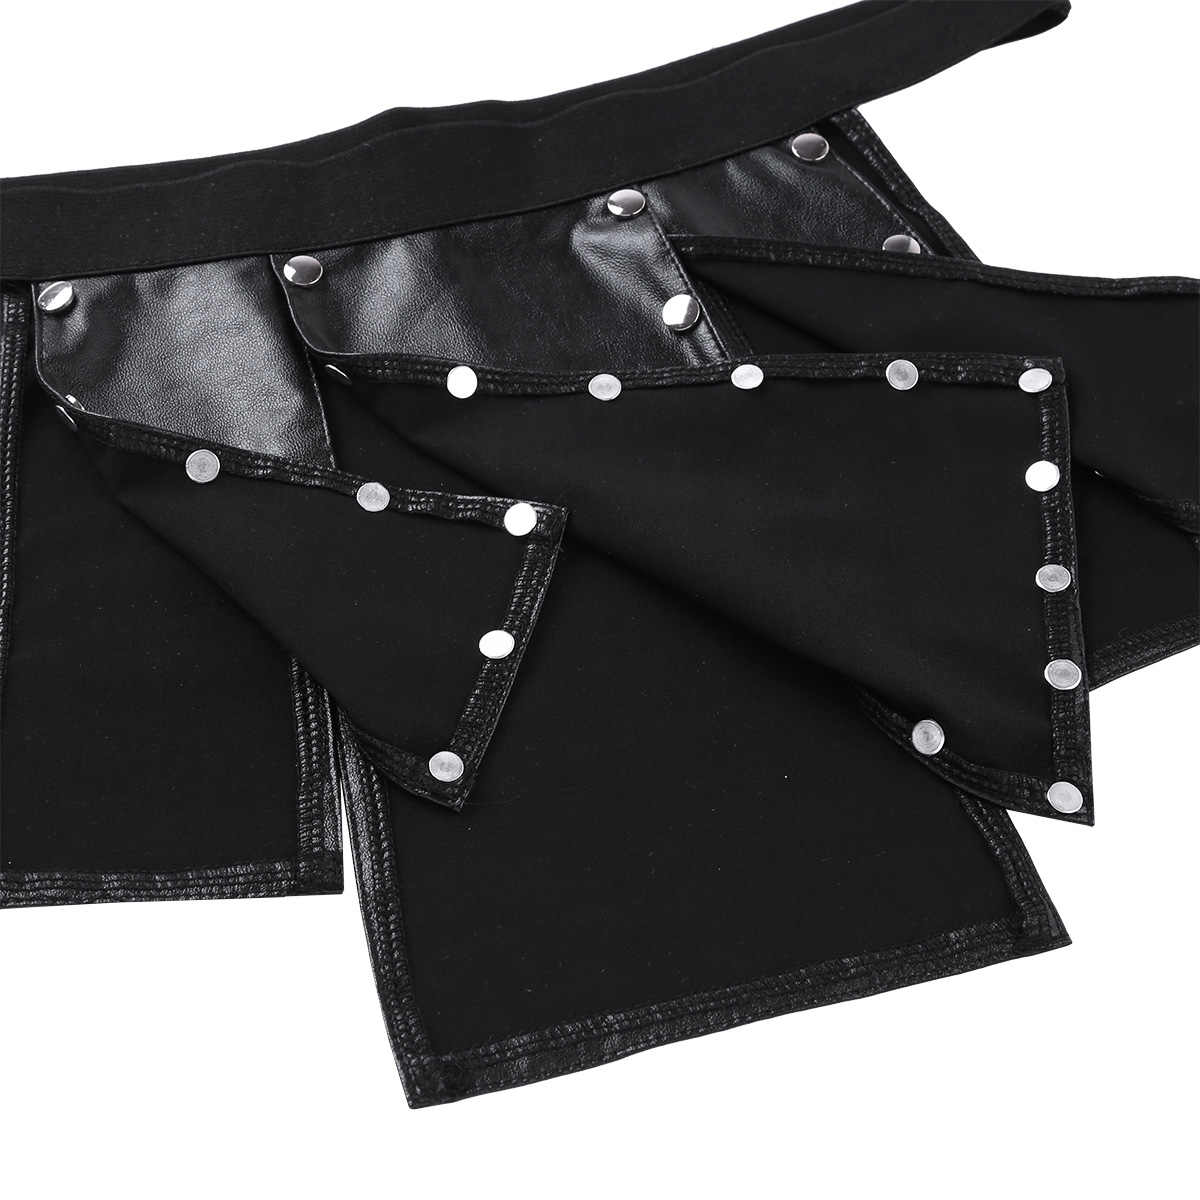 Zwart Heren Lingerie Ondergoed Panel Faux Lederen Rok Slipje Laagbouw Split Crotchless Kilt Ondergoed Clubwear Sexy Gay Rok